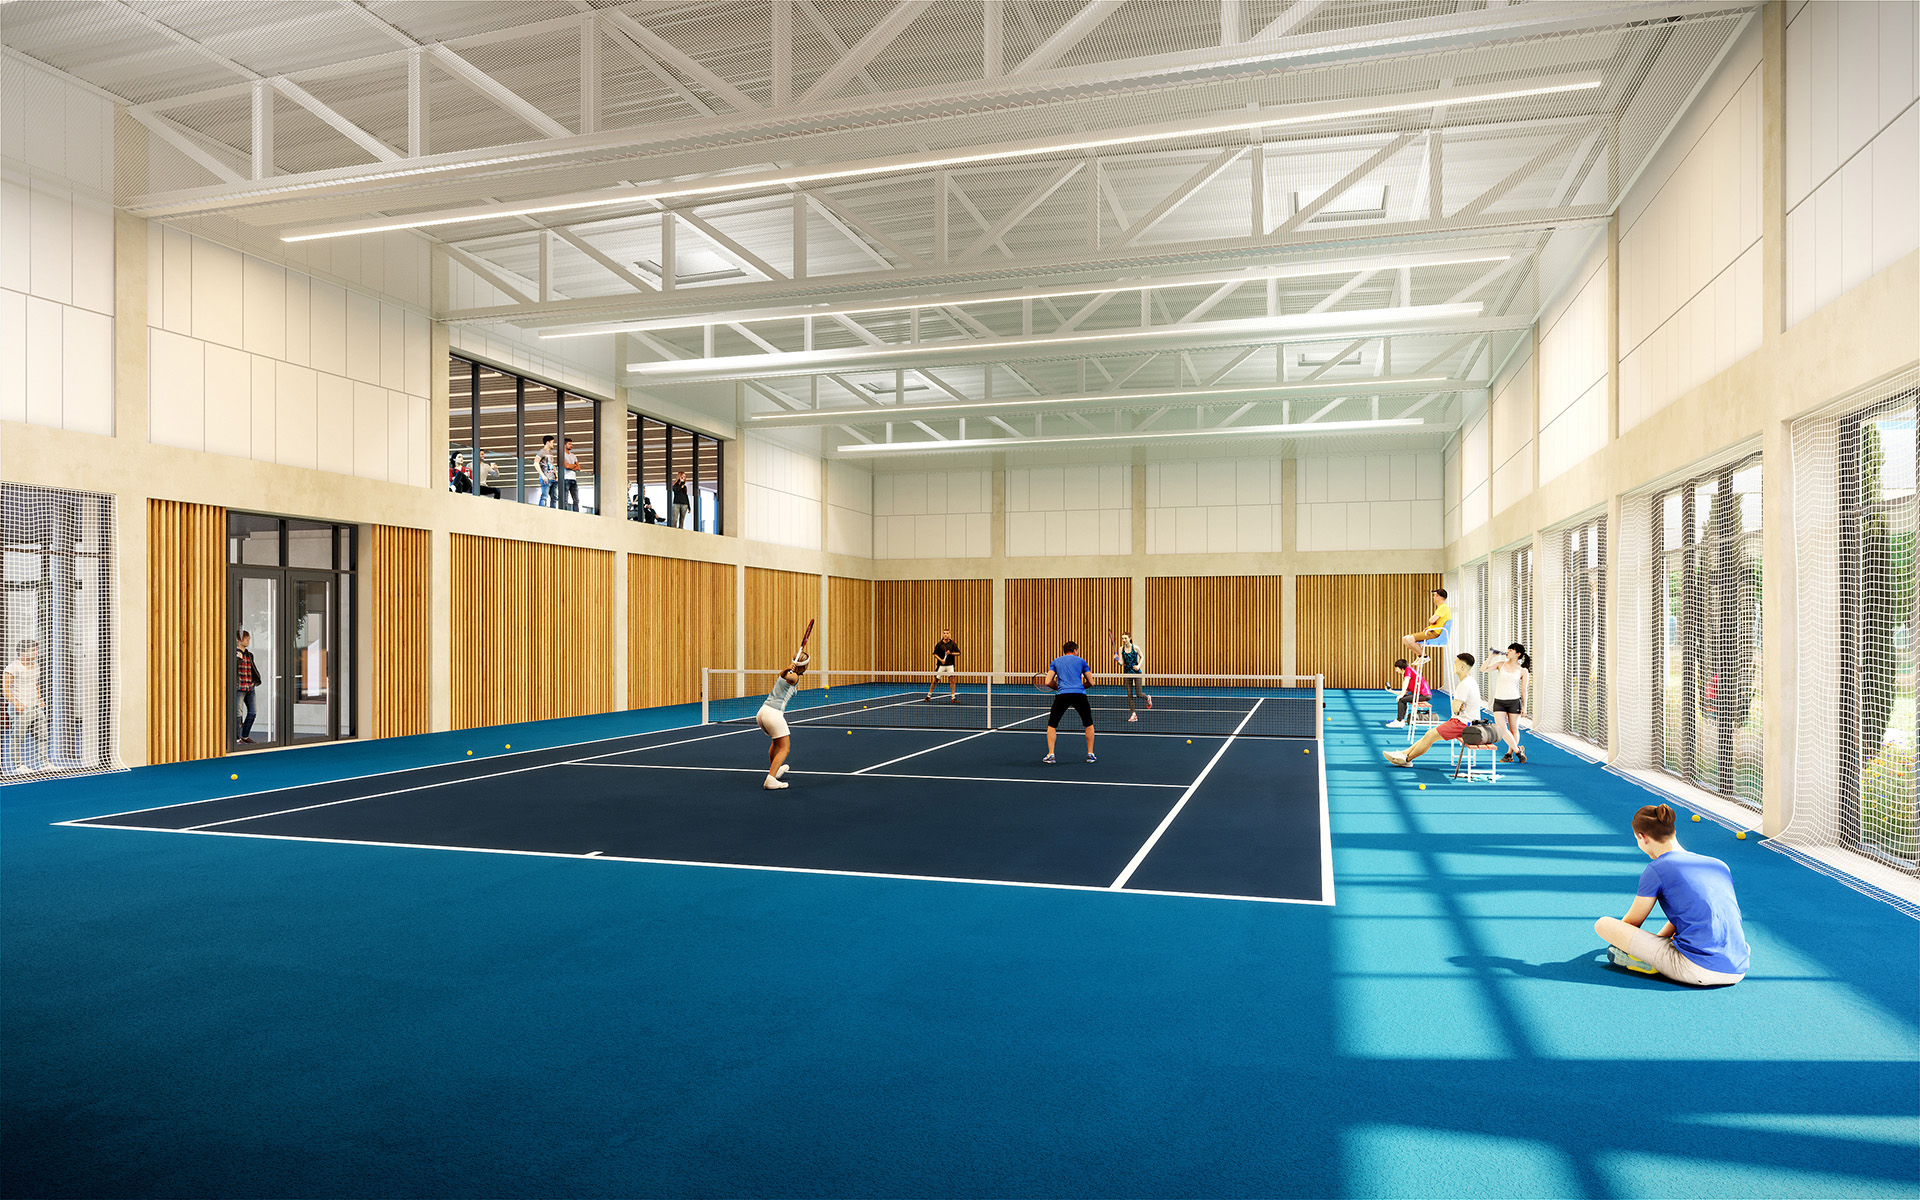 3D representation of an indoor tennis court